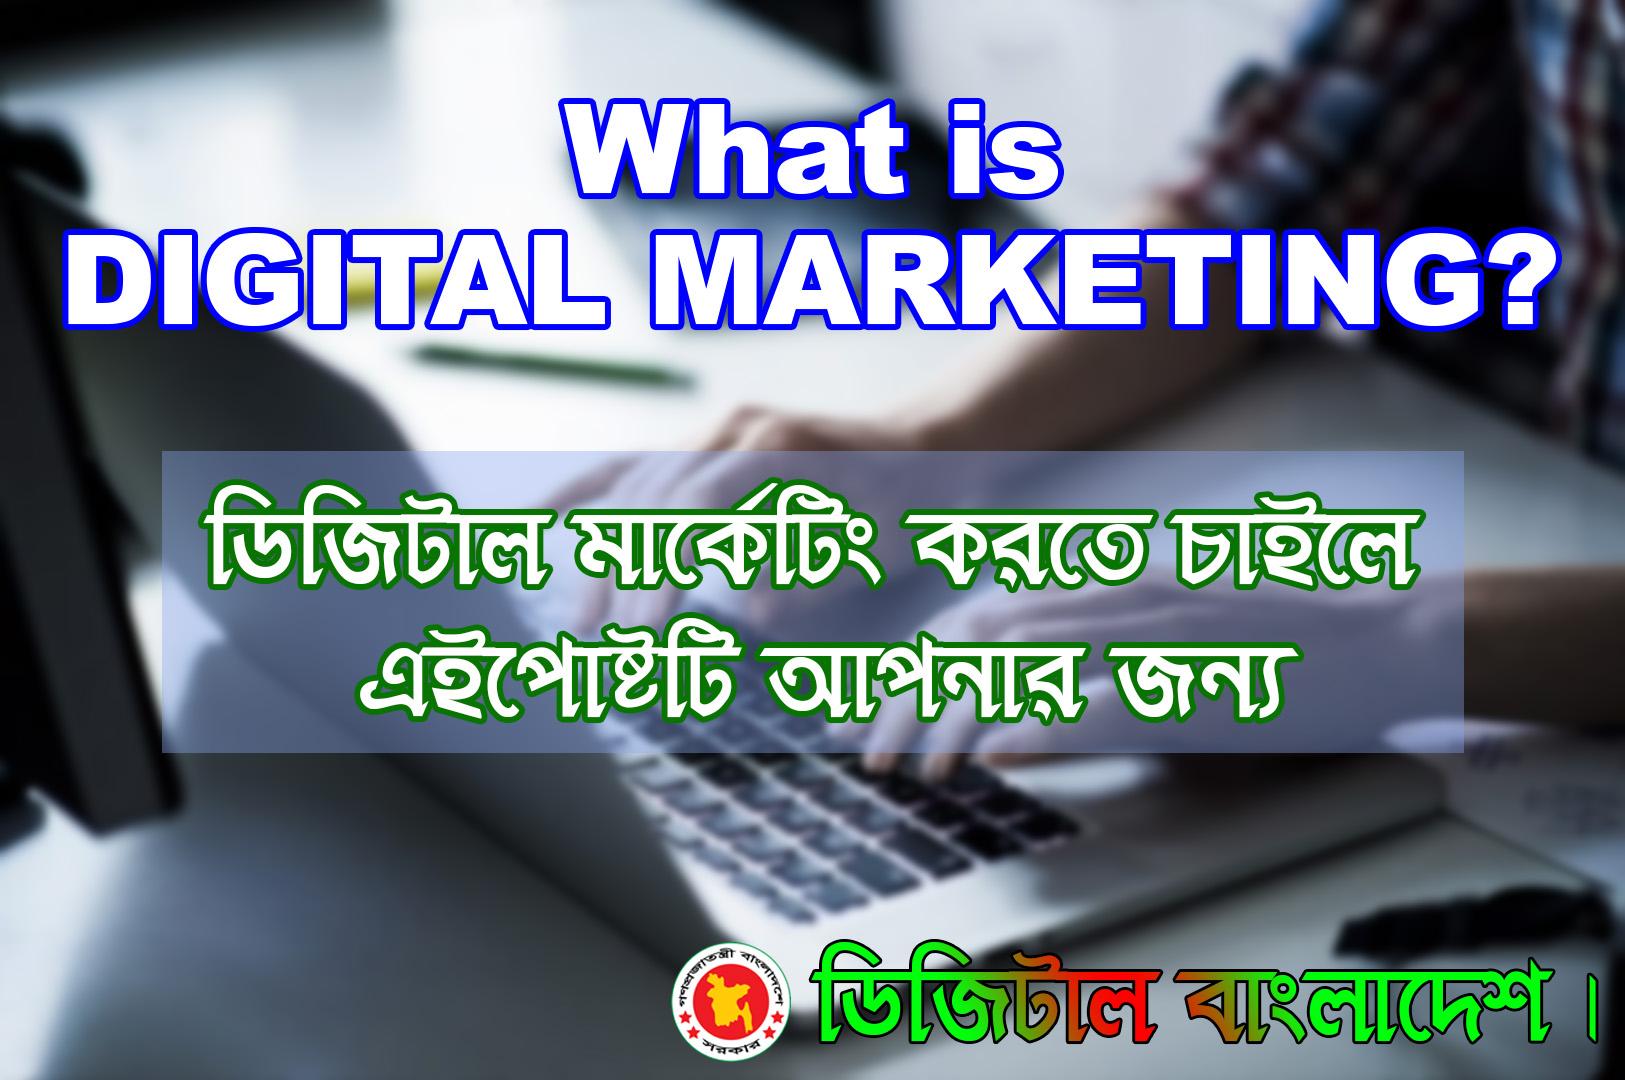 What is Digital Marketing? ডিজিটাল মার্কেটিং কি?